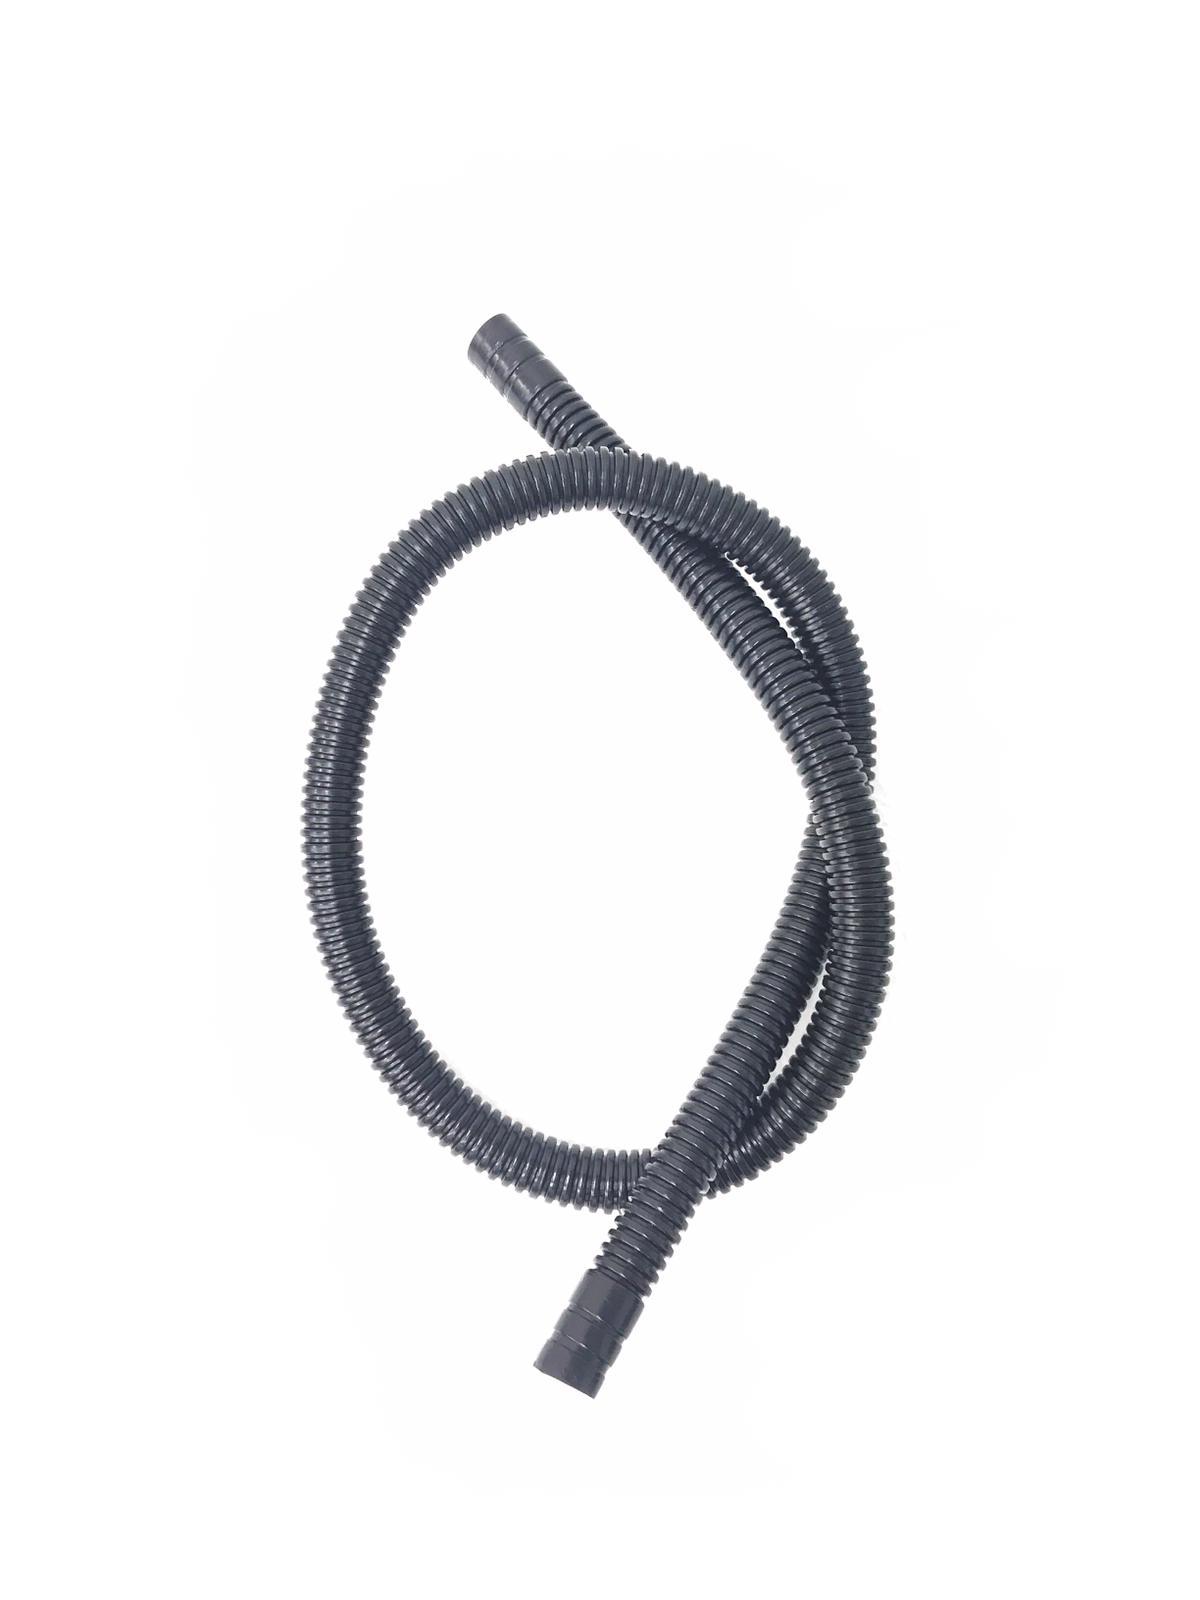 Flexible Hose (Black)